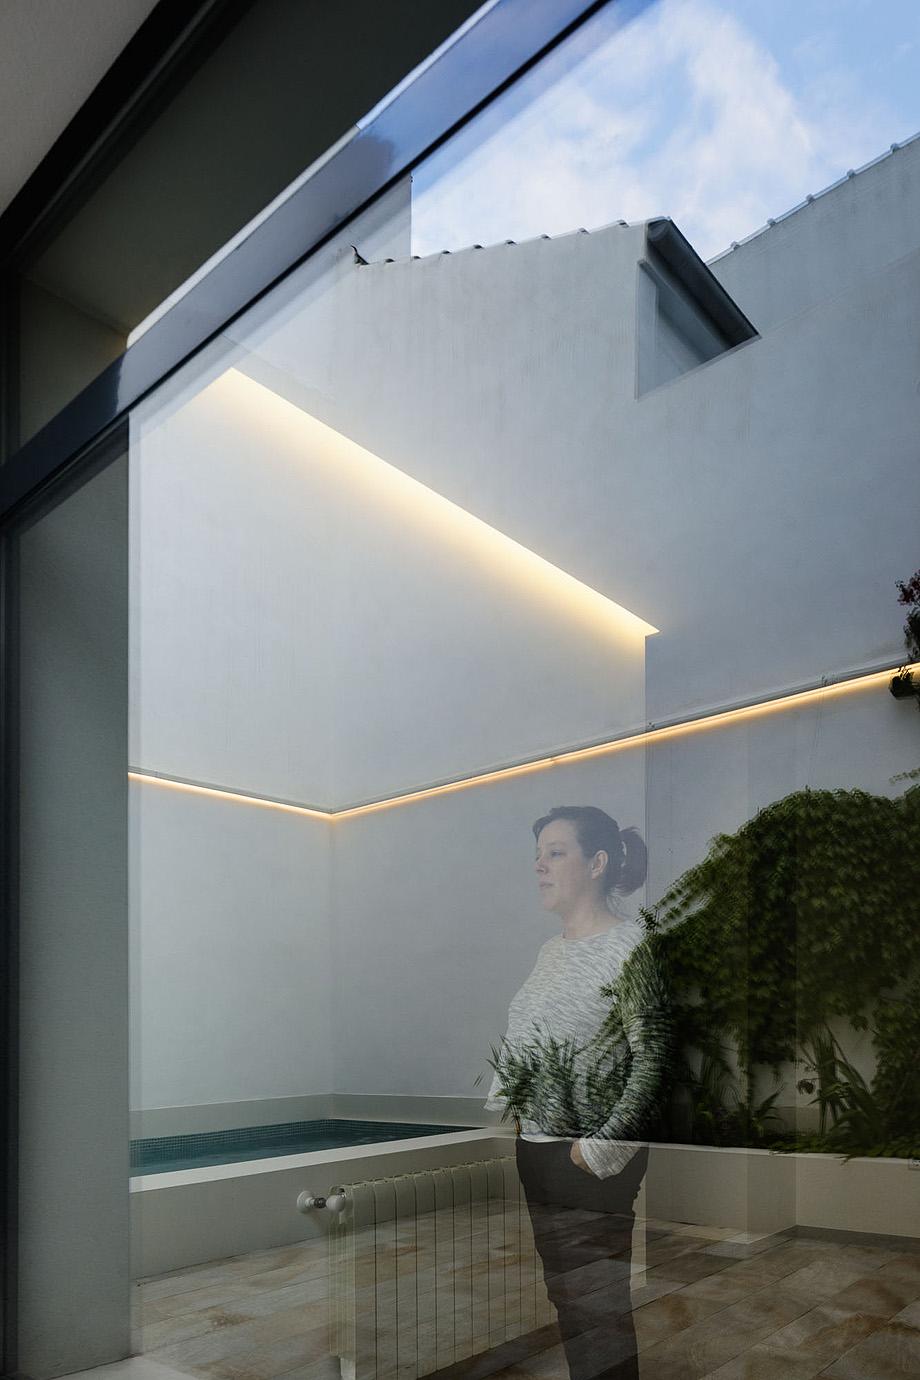 casa cr en sevilla de faq arquitectura - foto fernando alda (8)